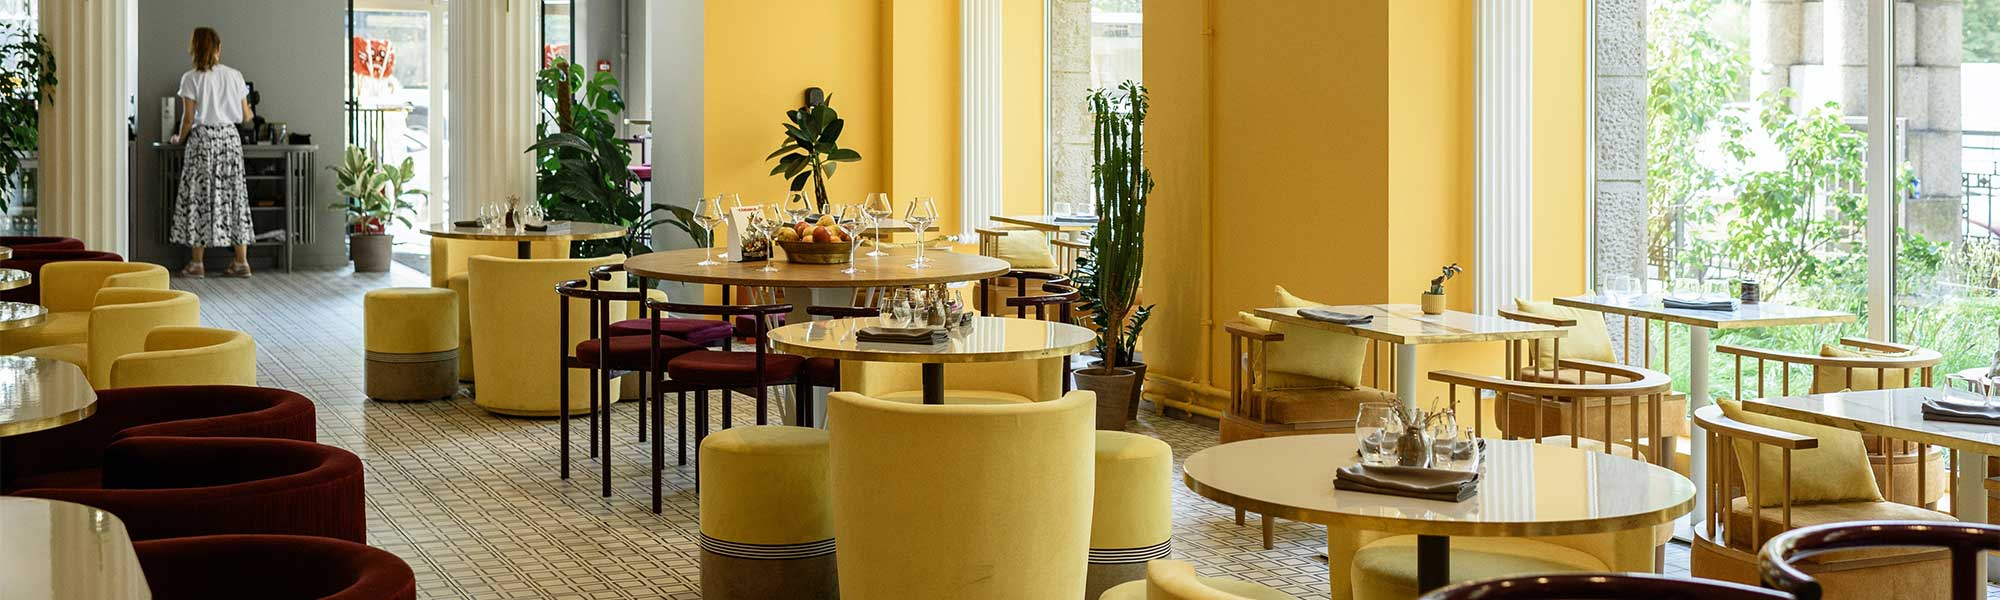 Online Essentials for Restaurants